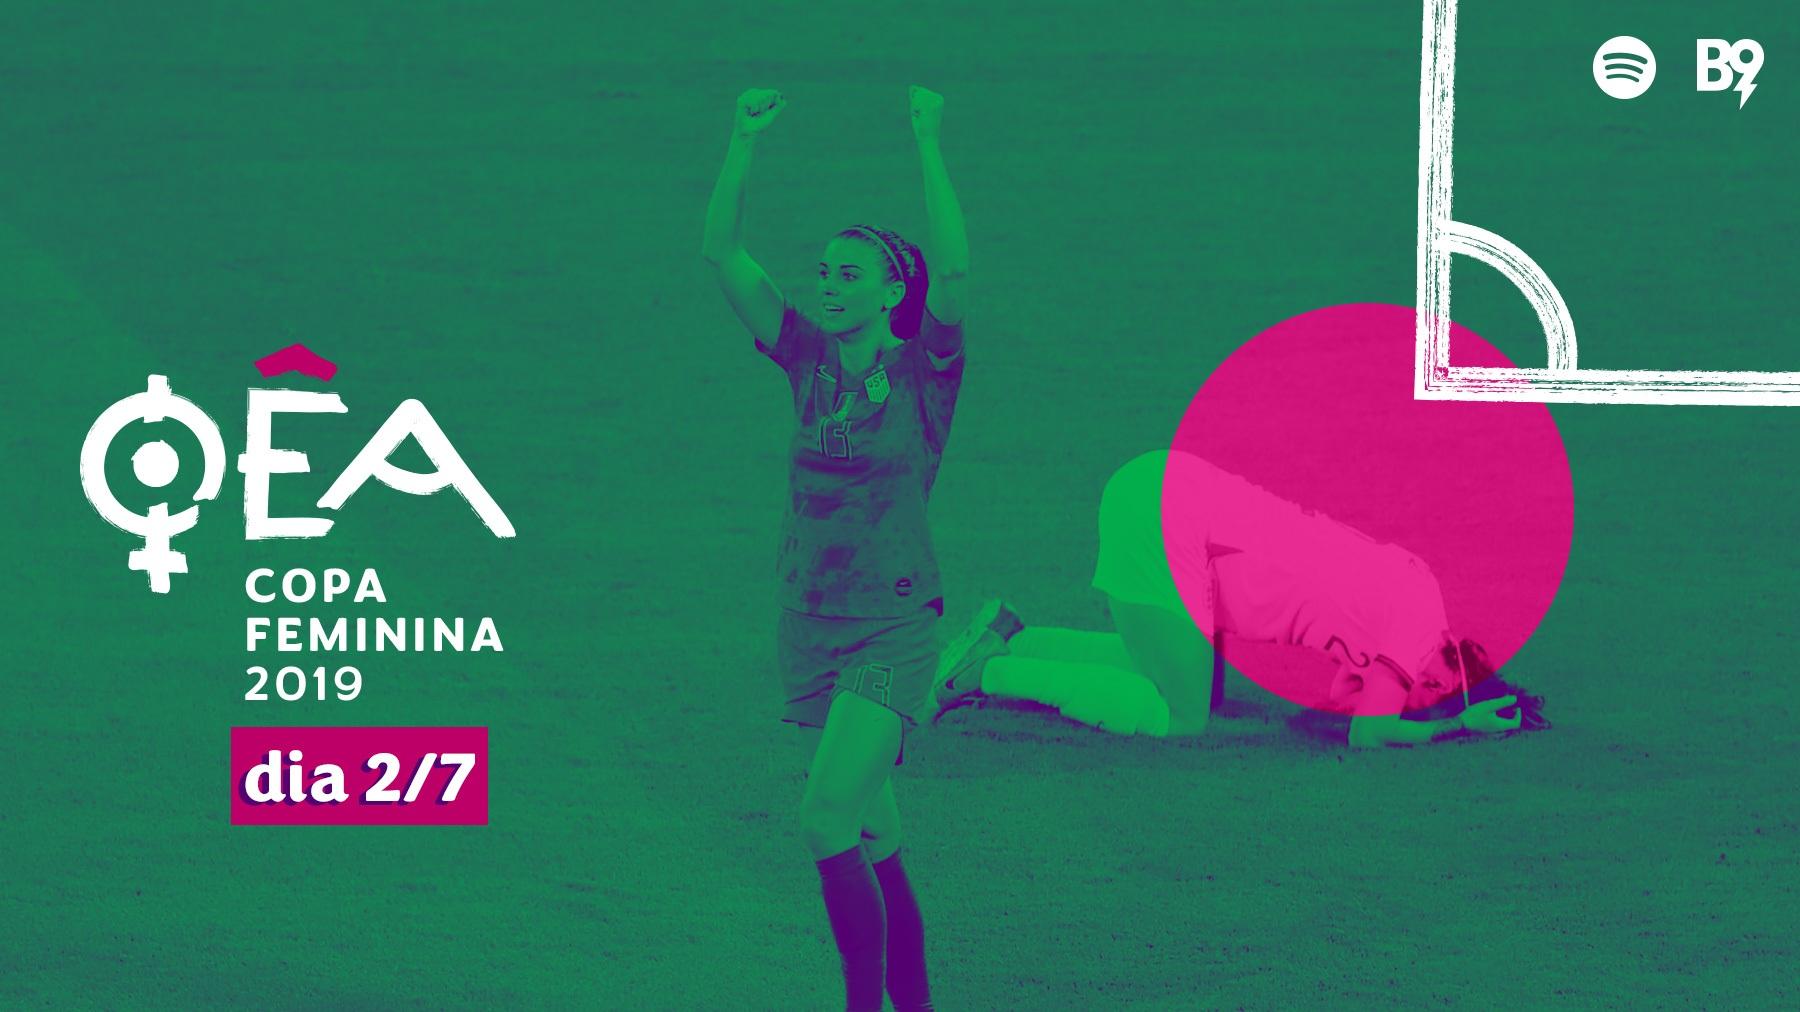 Oêa: Copa 2019 — 🏴 1-2 🇺🇸